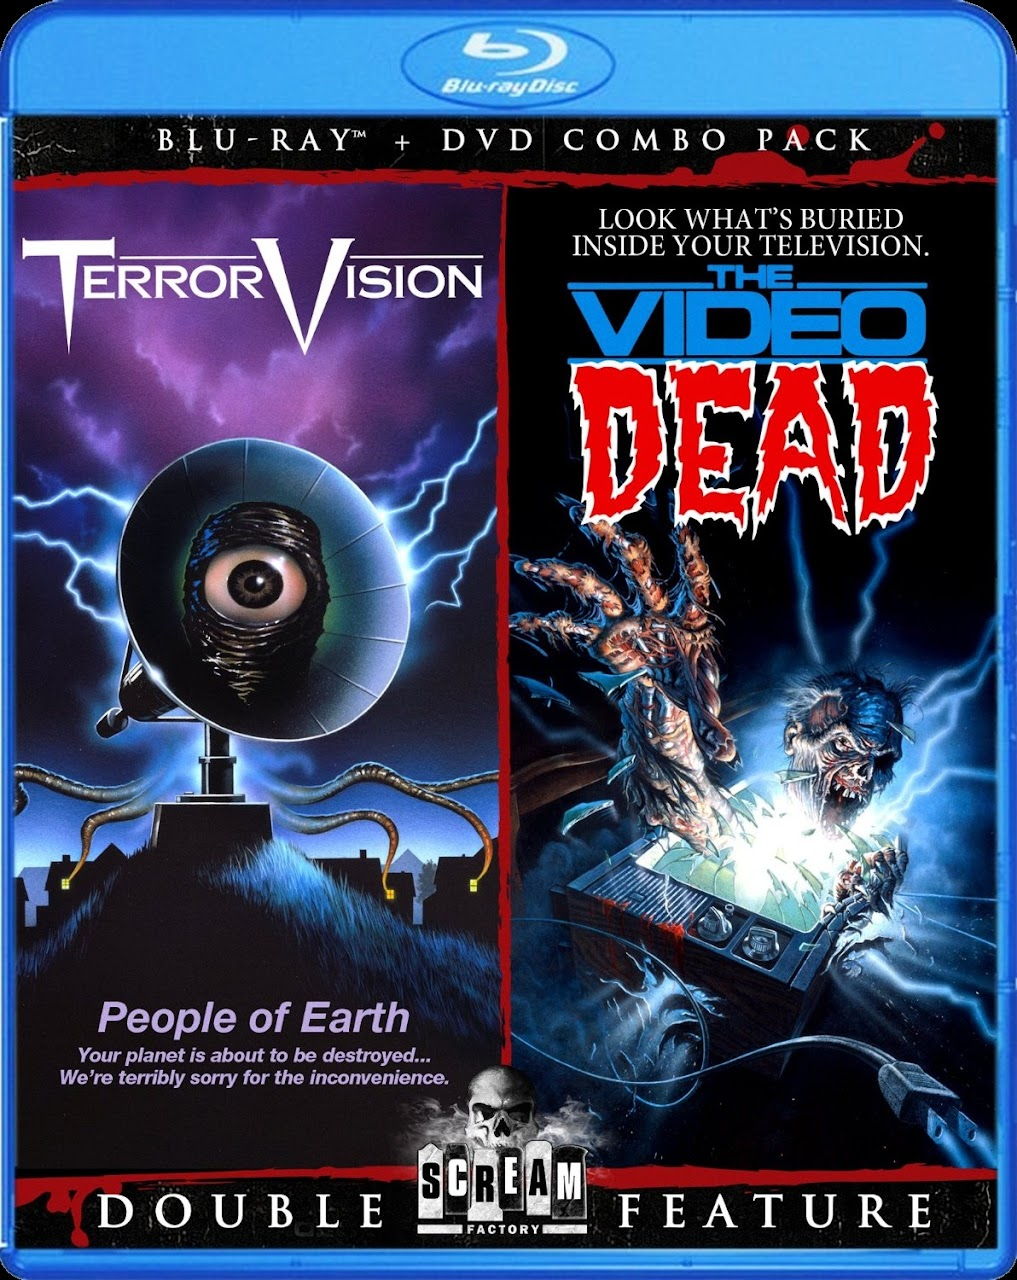 http://2.bp.blogspot.com/-_xE_TUdxYDw/UPn43y9fbDI/AAAAAAAACPo/9wNTheUdggg/s1280/terrorvision_video_dead_scream_factory_shout_factory_blu-ray_dvd_combo.jpg